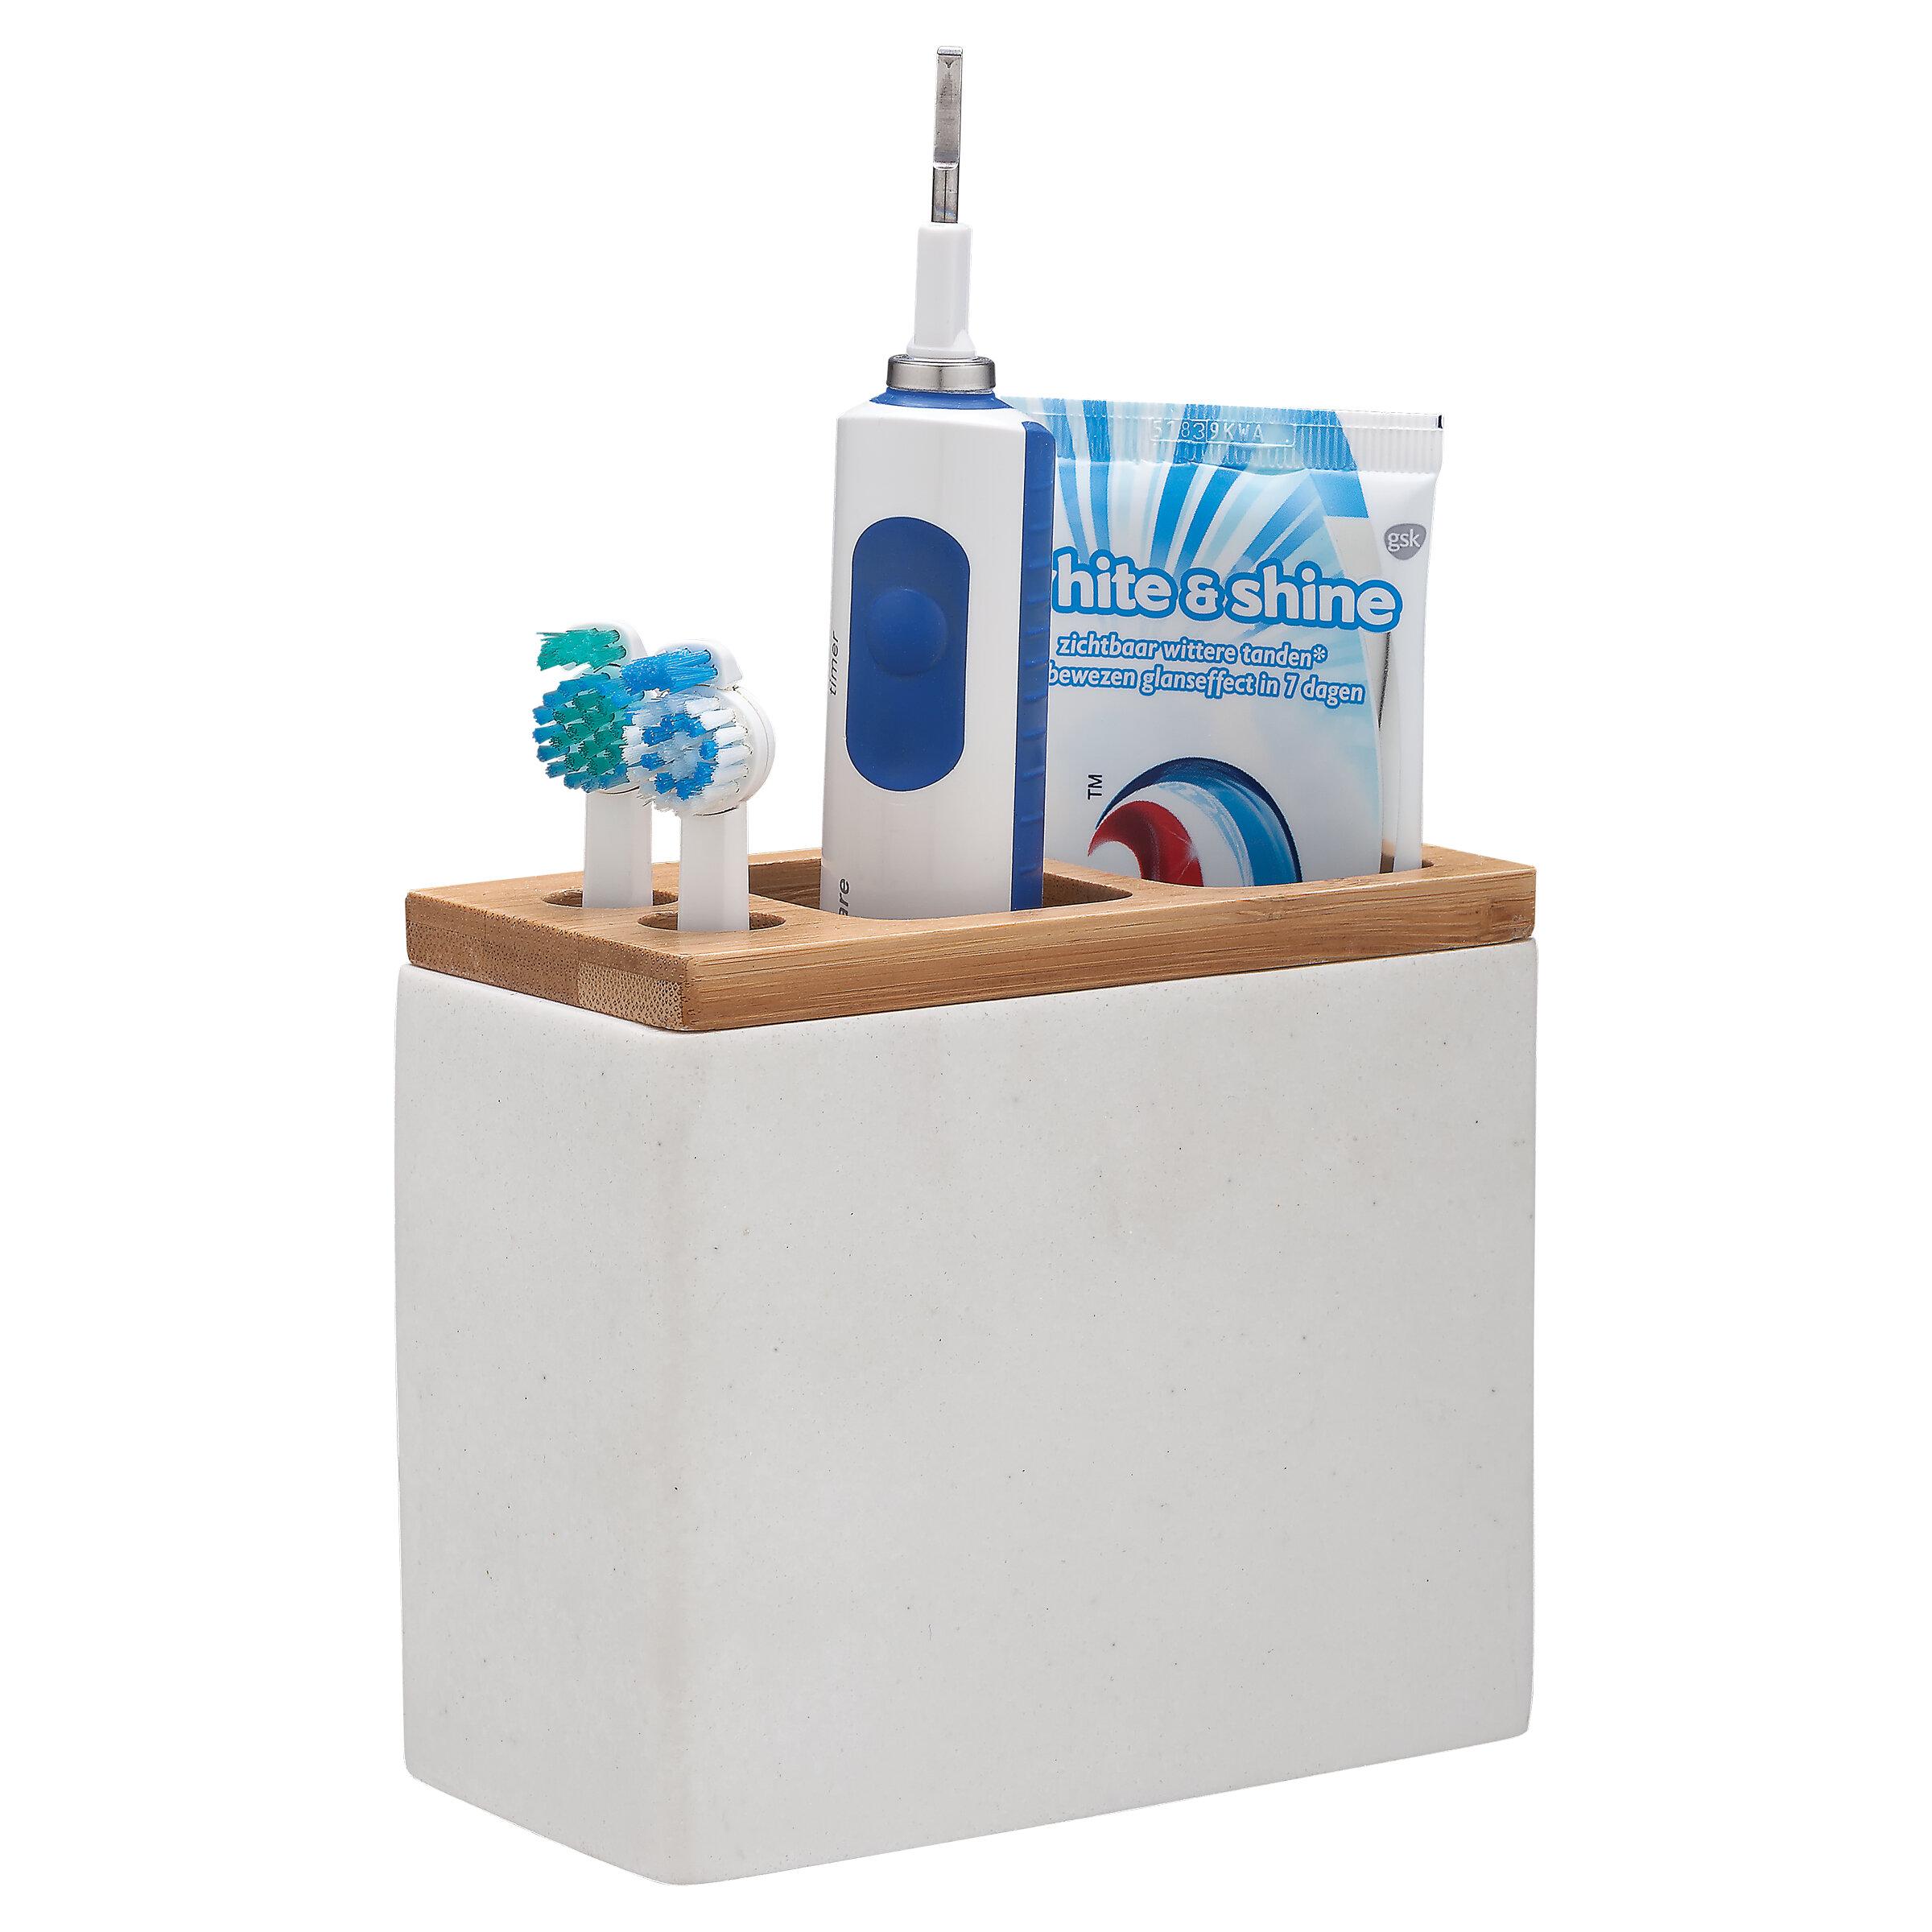 Familie Badezimmer Kunststoff Zahnbürste Zahnpasta Rasierer Halter Behälter